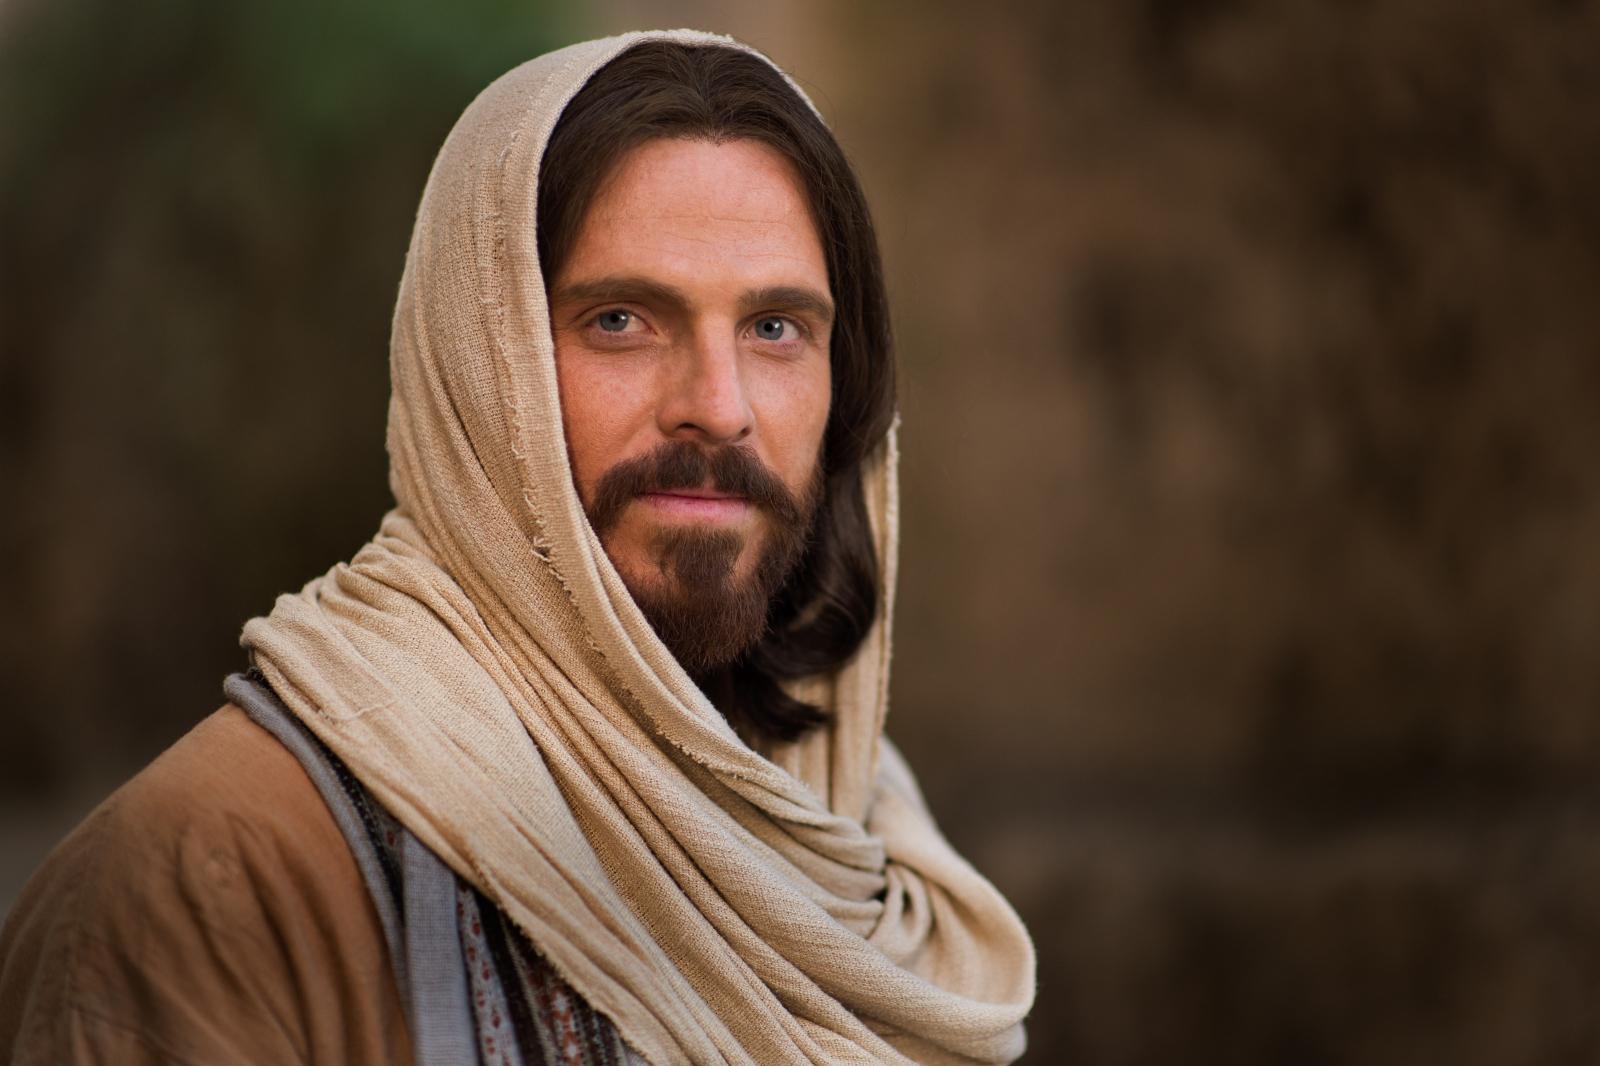 pictures-of-jesus-1138494-print